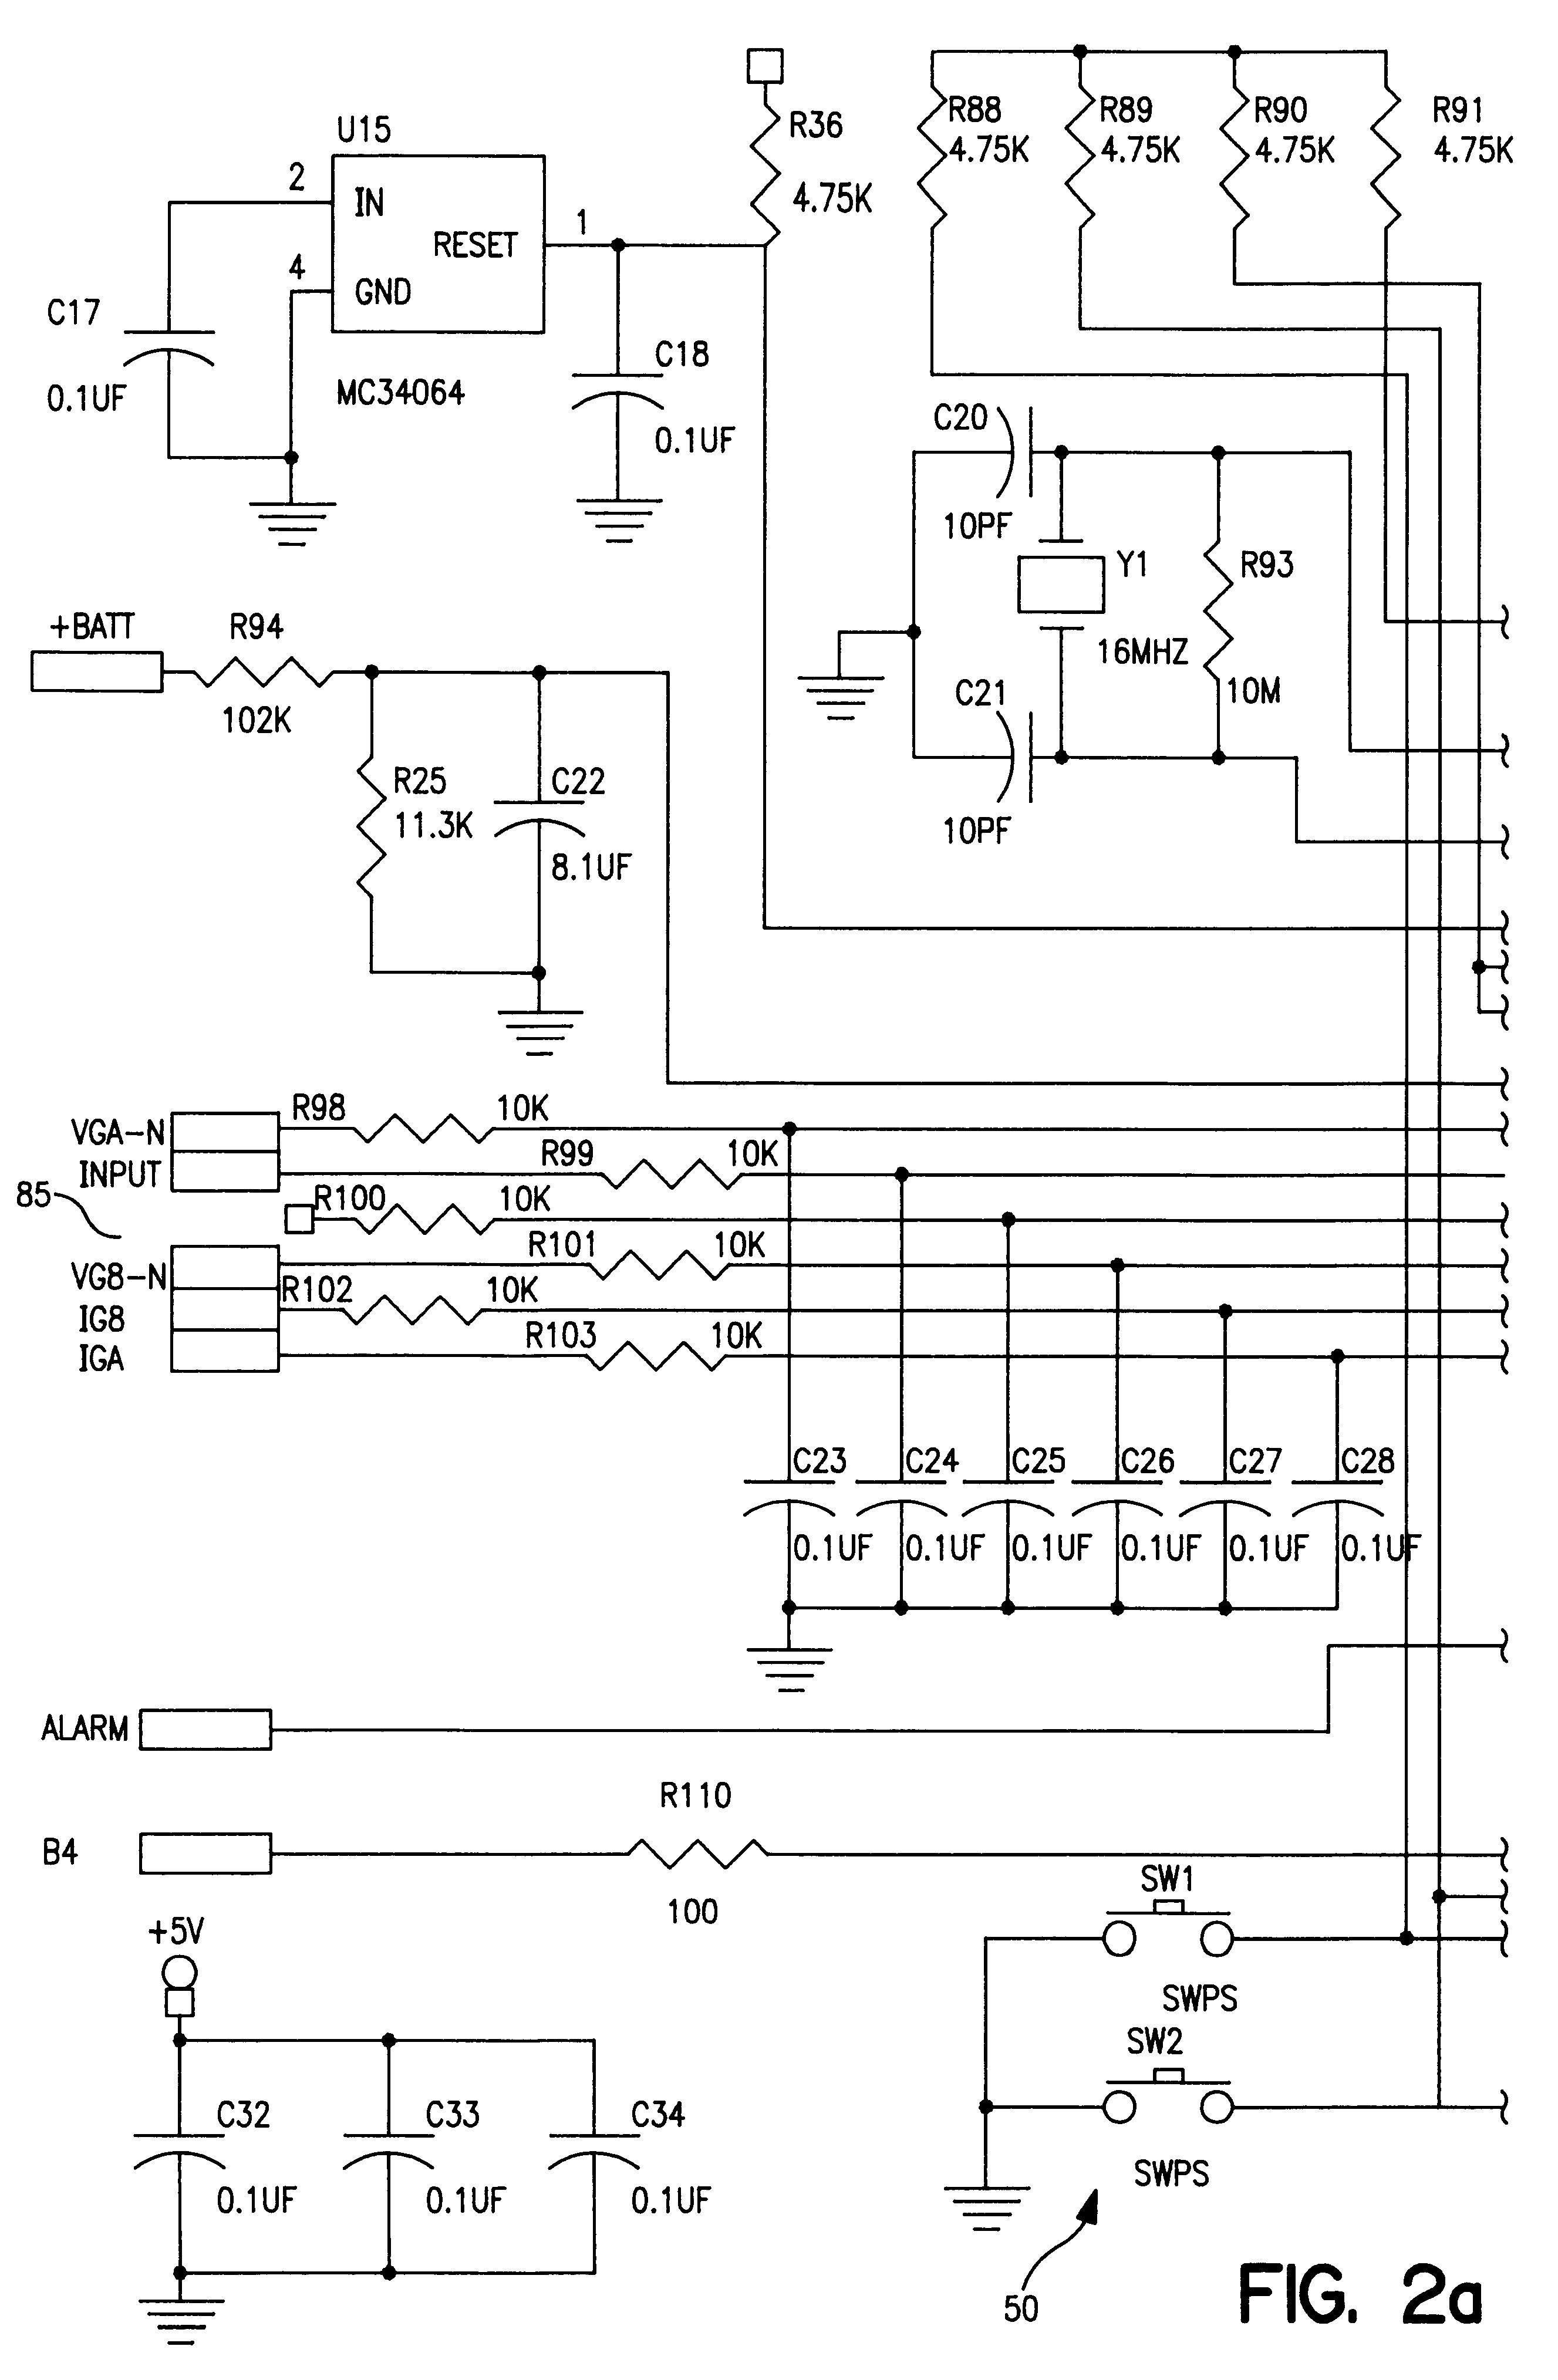 Generac Transfer Switch Wiring Diagram - Panoramabypatysesma - 200 Amp Automatic Transfer Switch Wiring Diagram